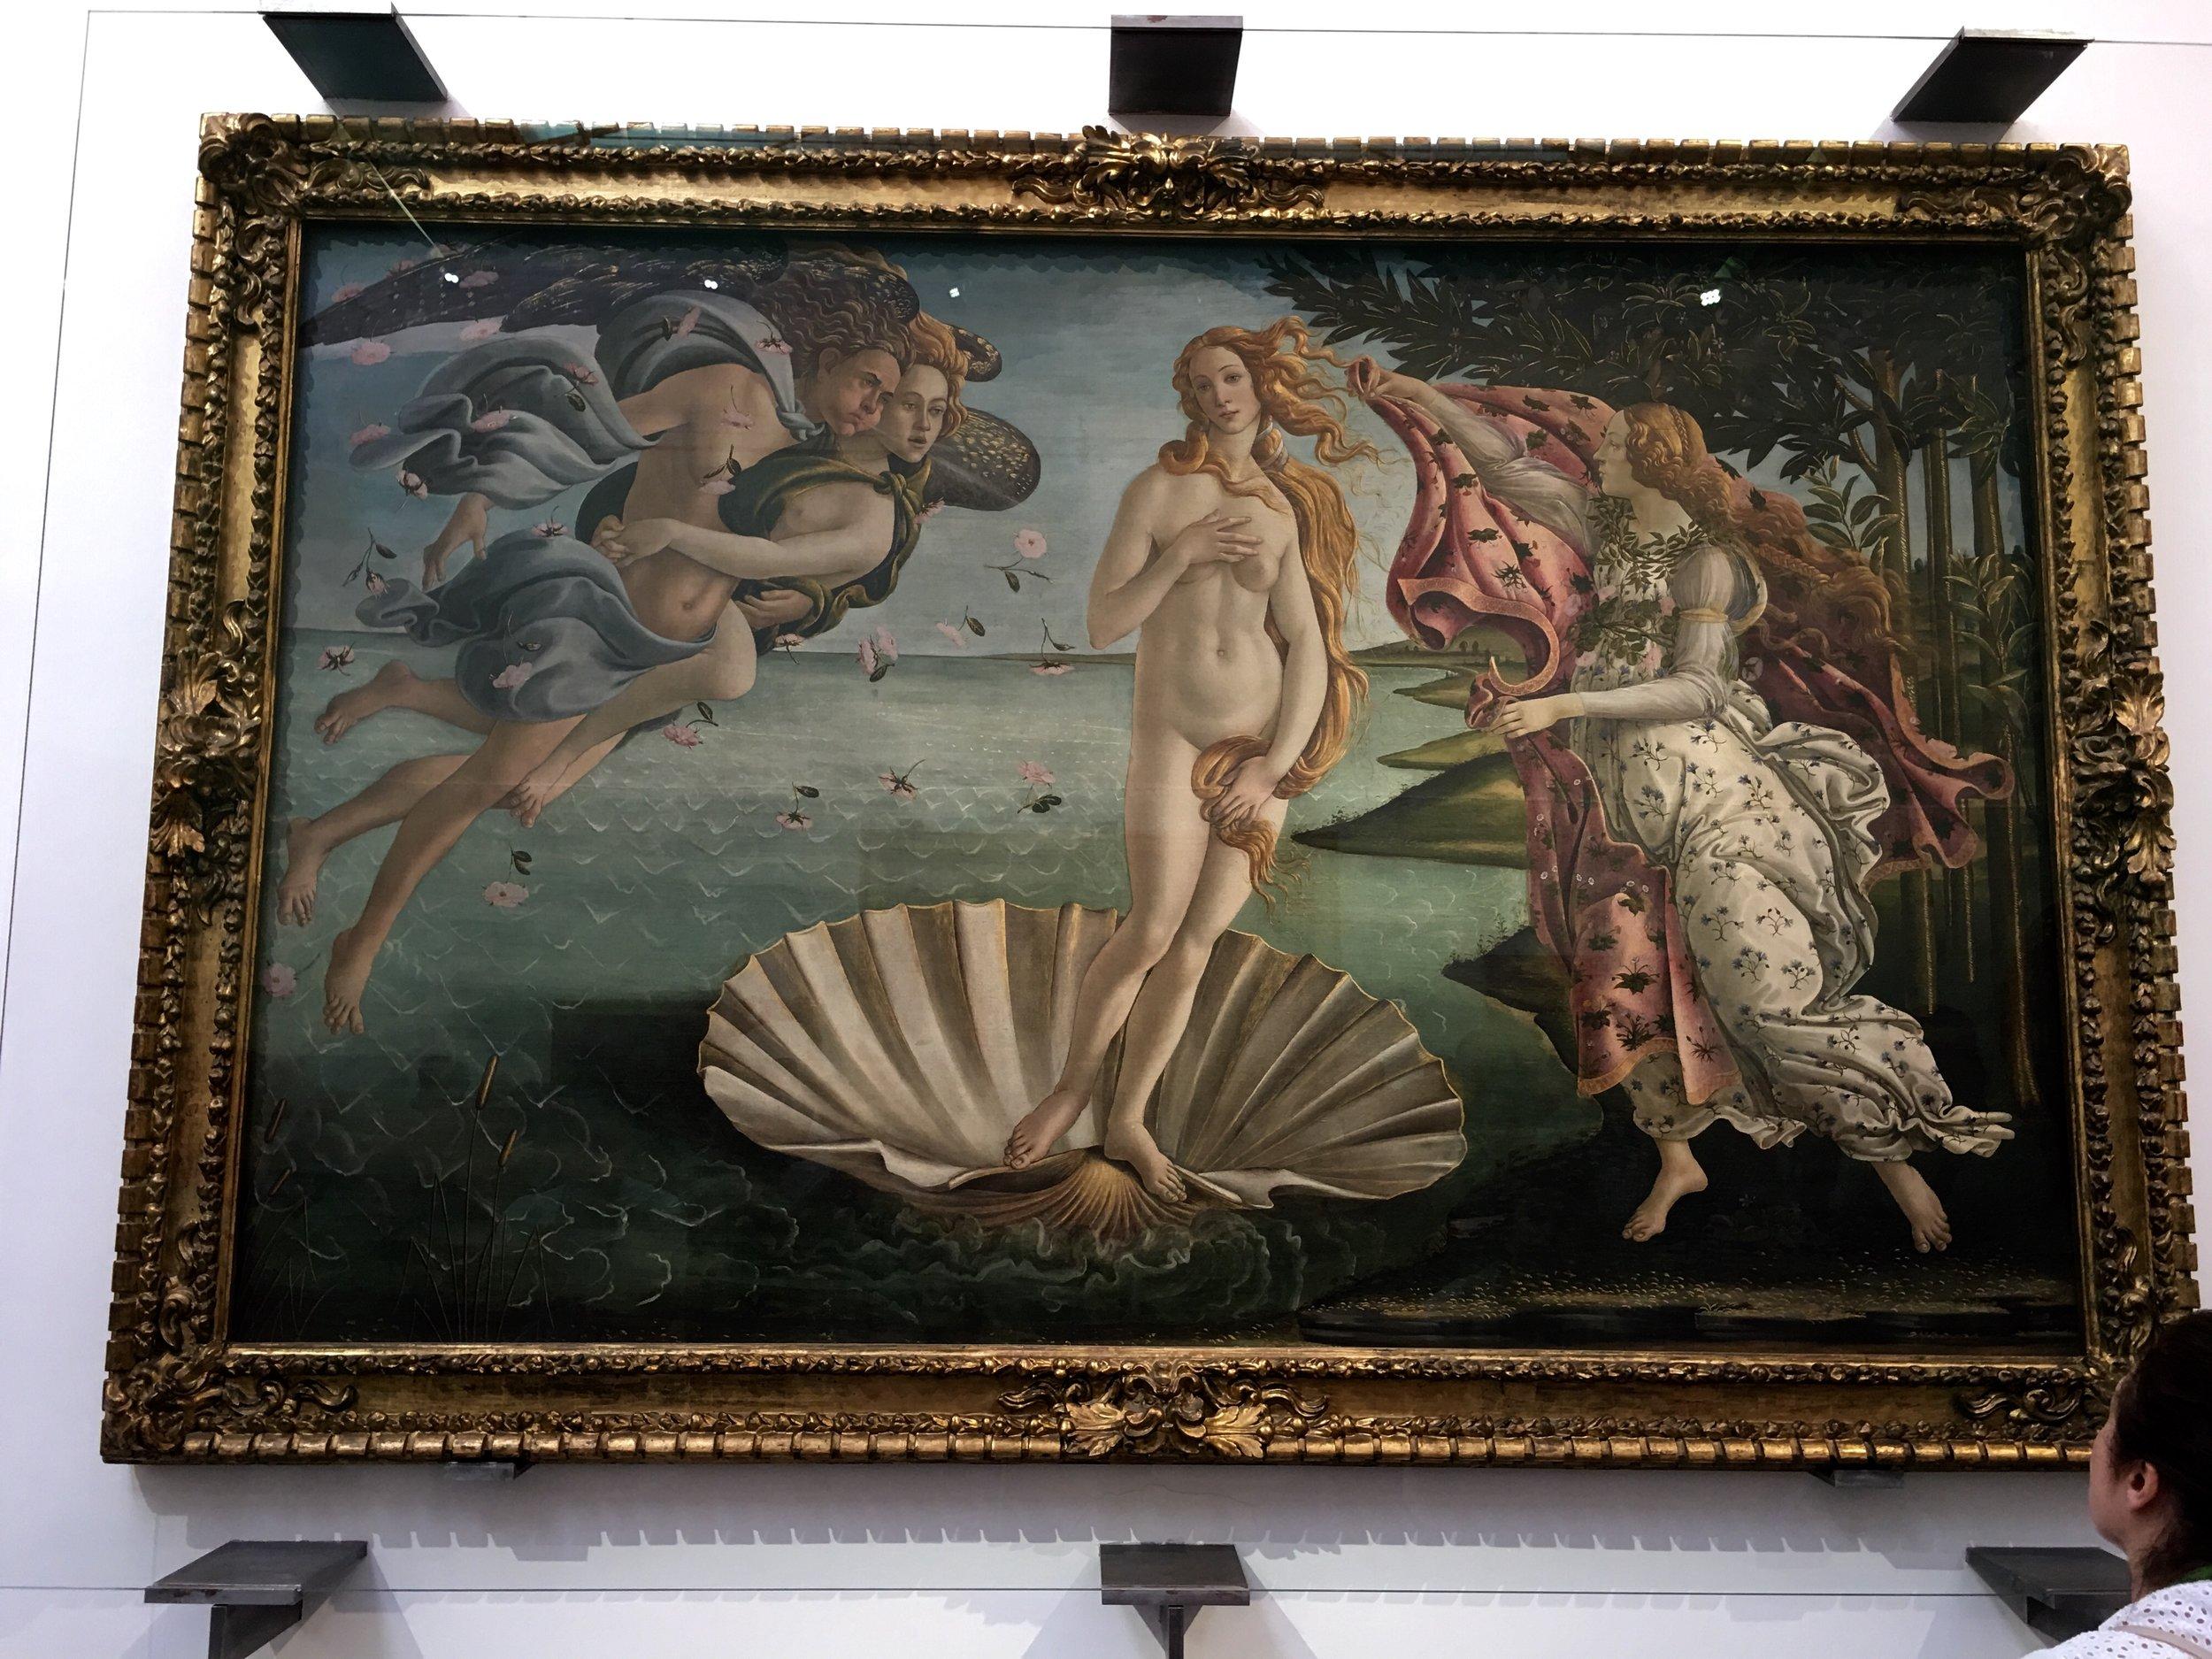 BOTTICELLI - THE BIRTH OF VENUS